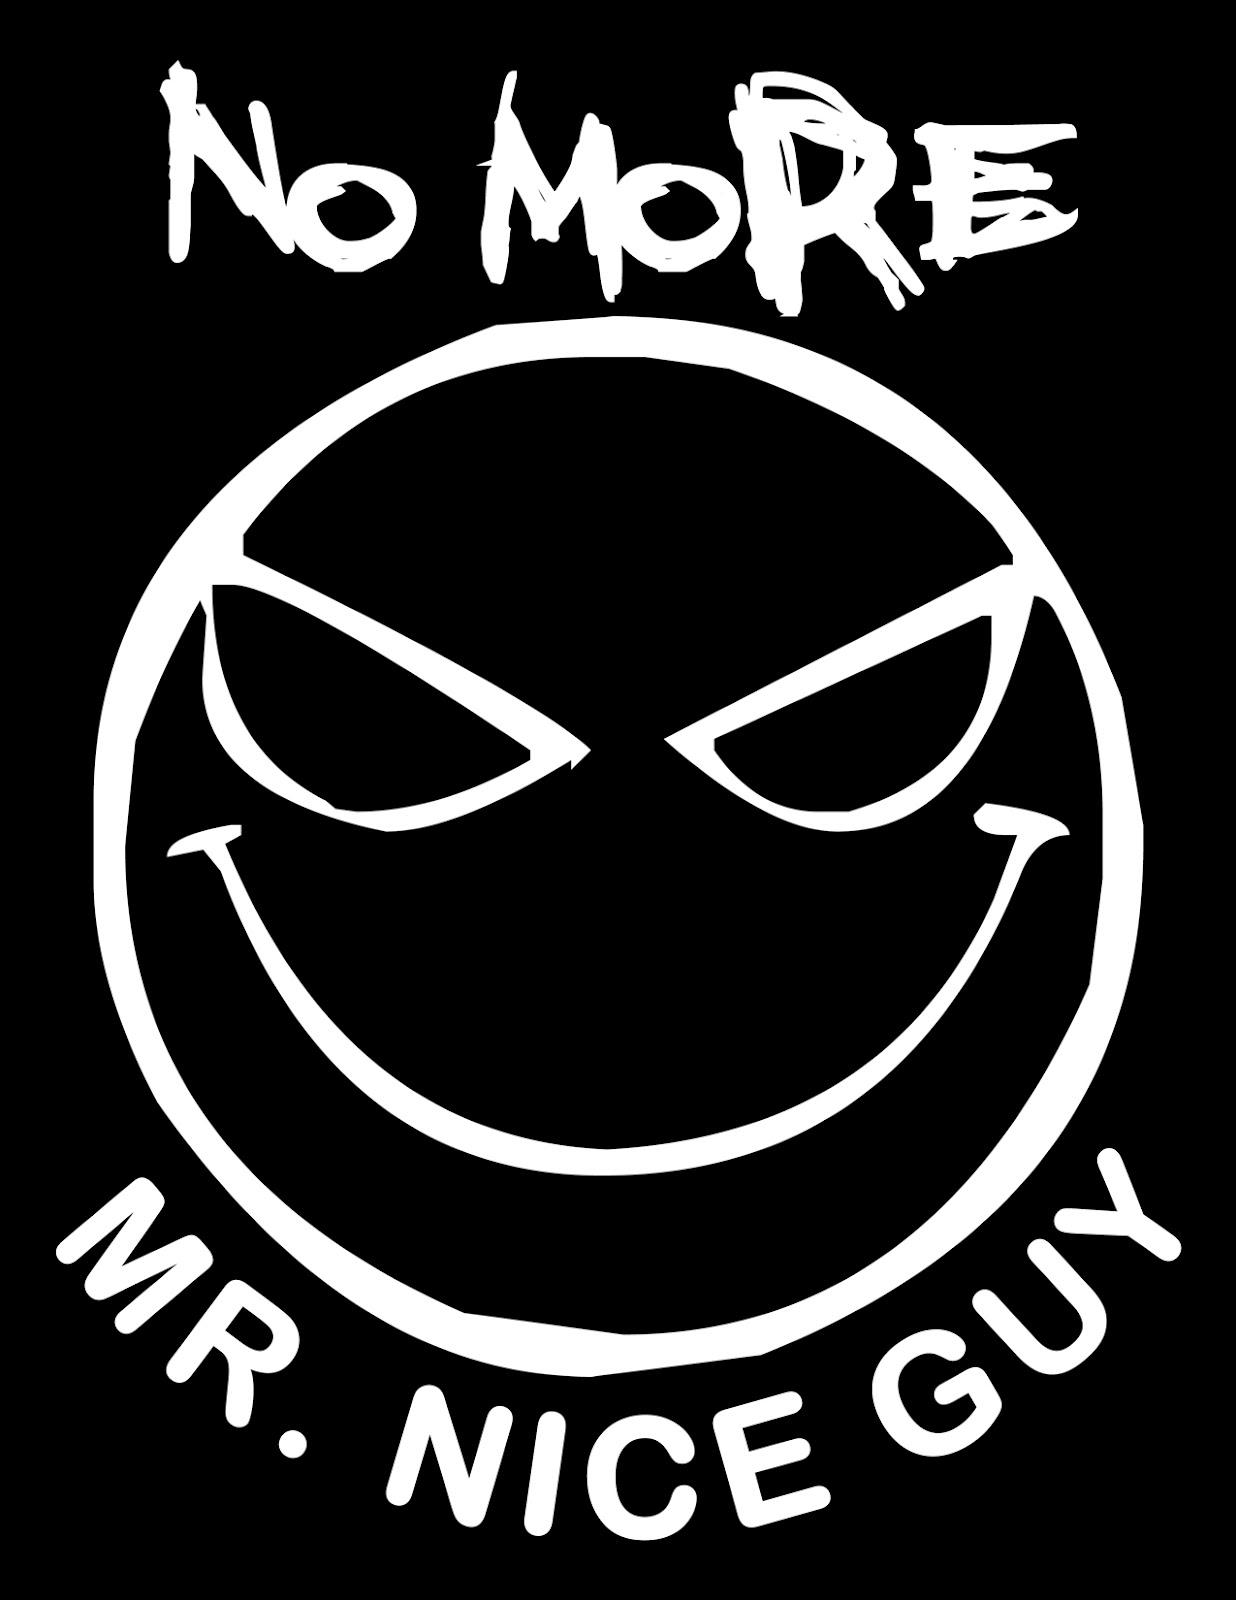 http://4.bp.blogspot.com/-NdFYIgZNb0E/T7VG4PIanTI/AAAAAAAAD-o/KCL_-8emxQI/s1600/No+More+Mr-1.+Nice+Guy+-+logo.jpg